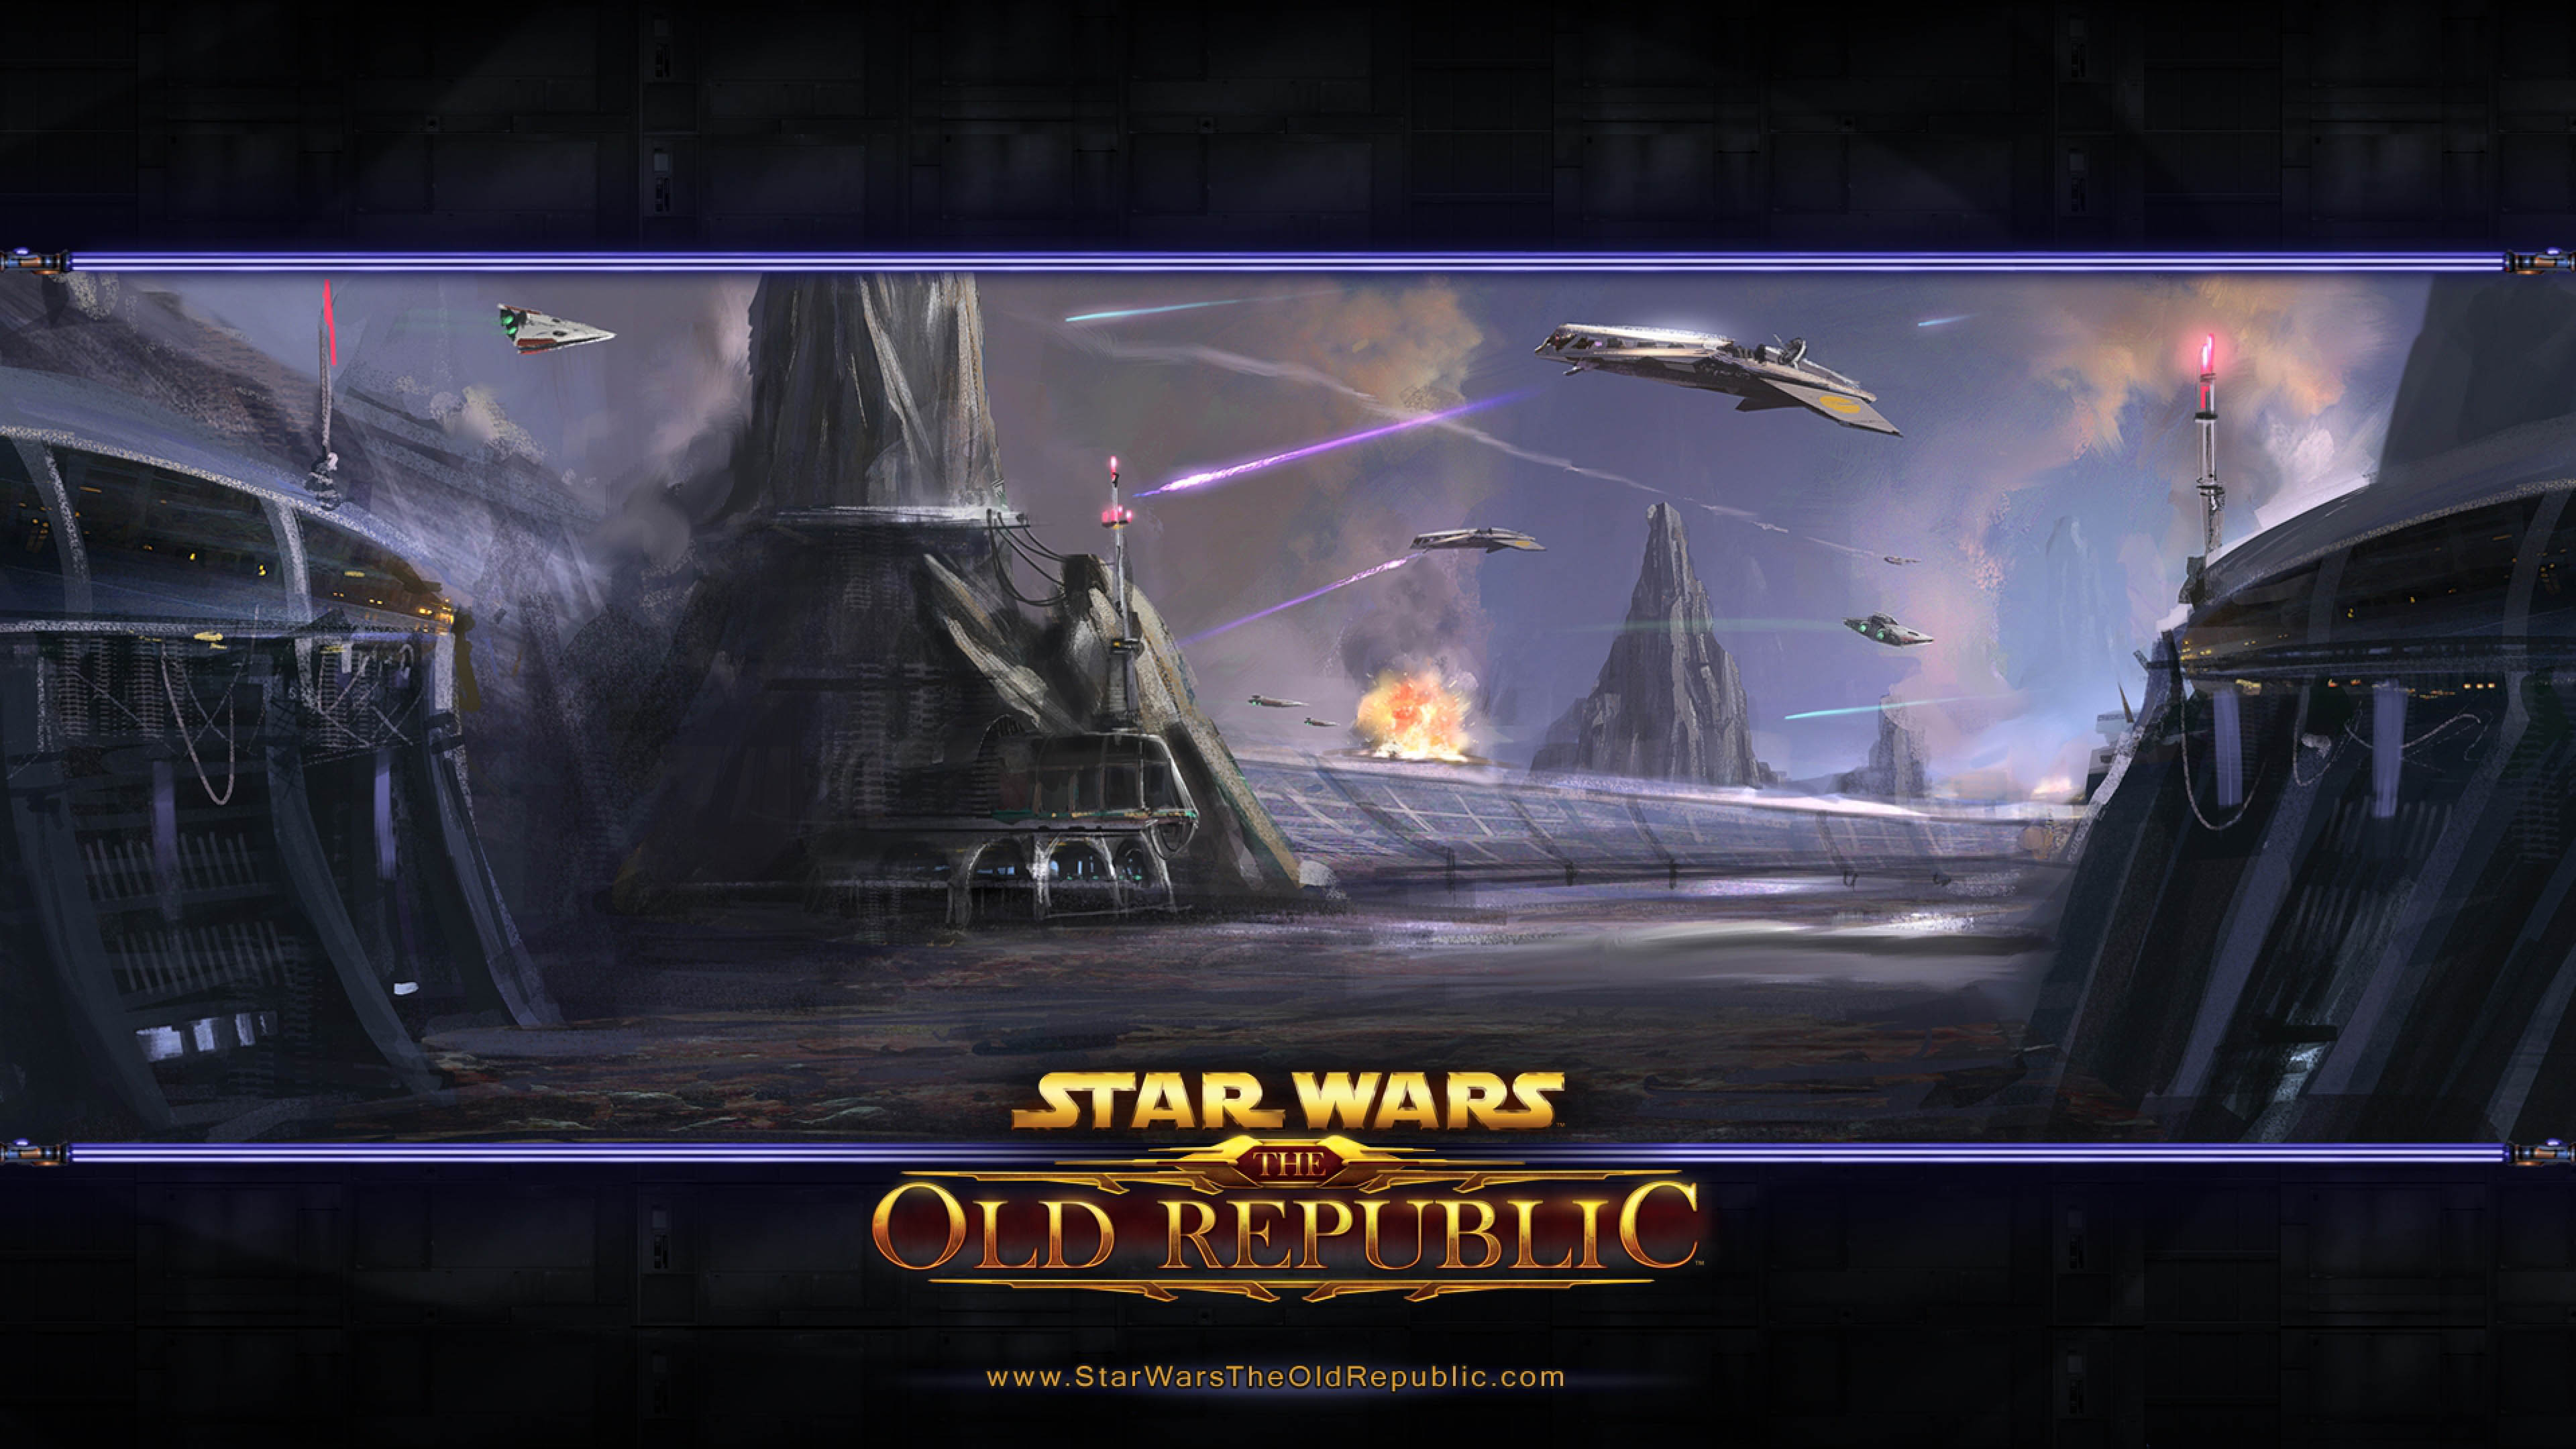 Star Wars The Old Republic   Landscape Artwork 3840x2160 wallpaper 3840x2160